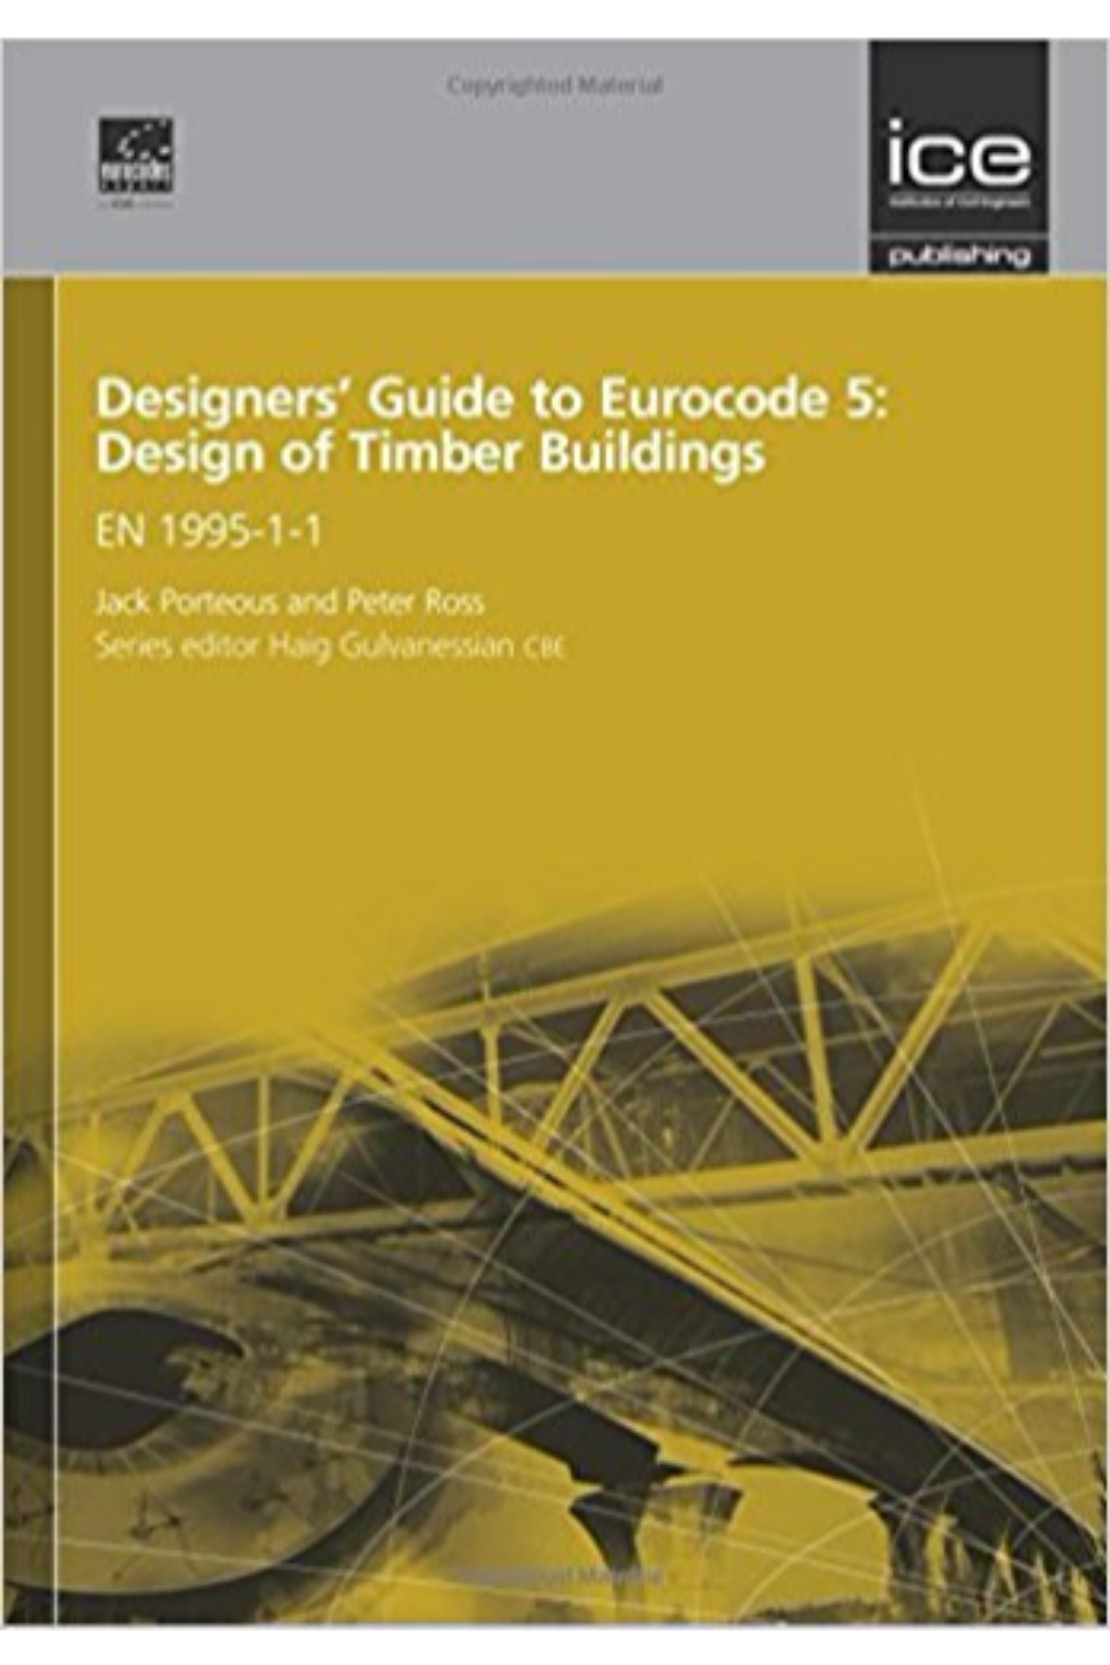 378300be9b340 Designer S Guide To Eurocode 5  Design Of Timber Buildings En 1995-1 ...